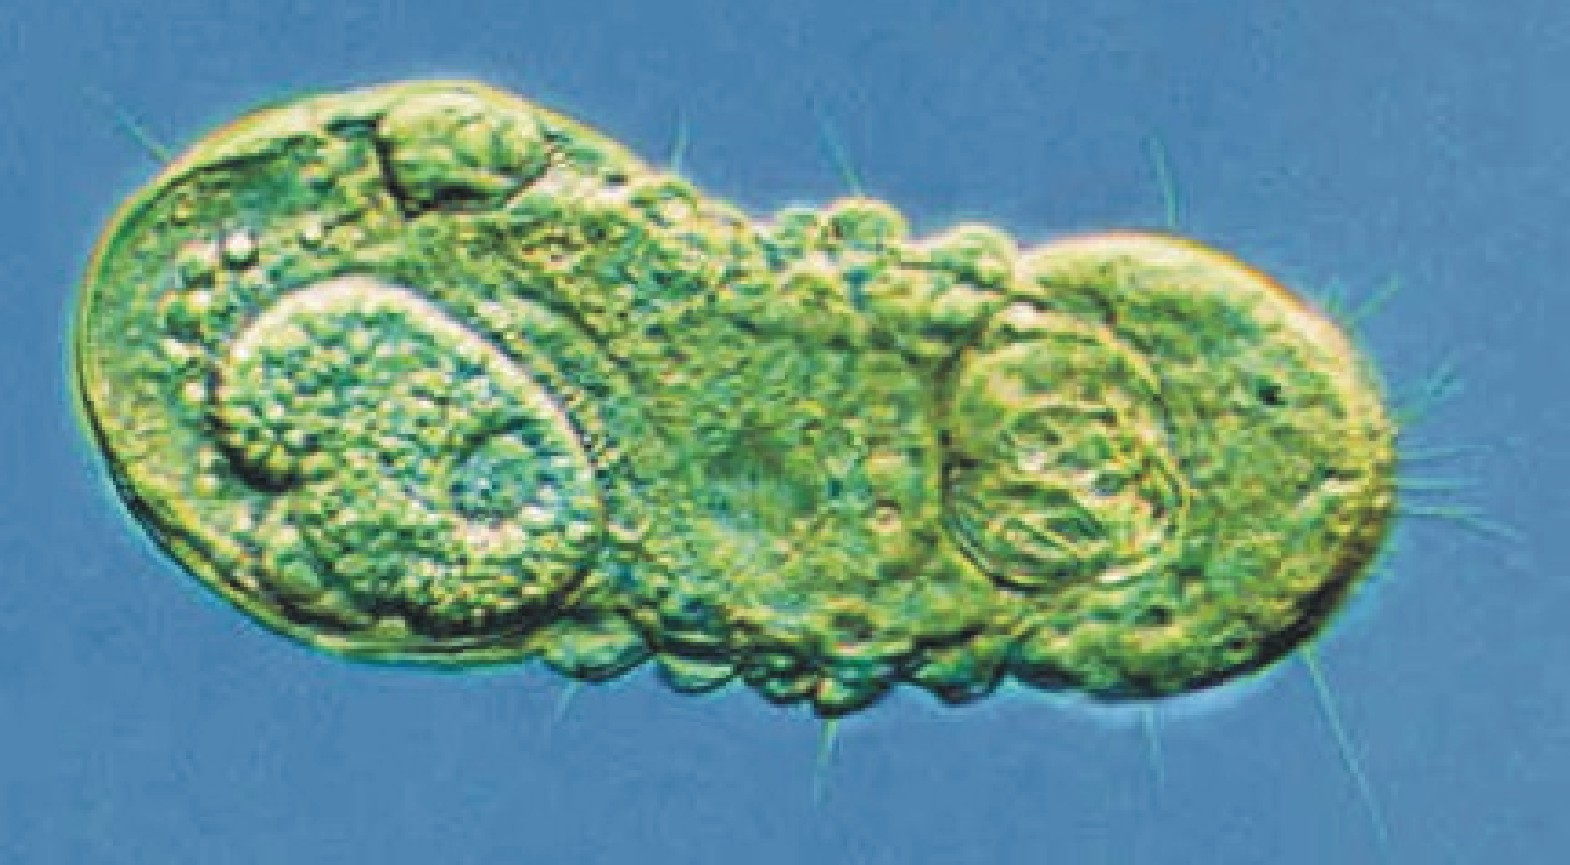 Micrognathozoa